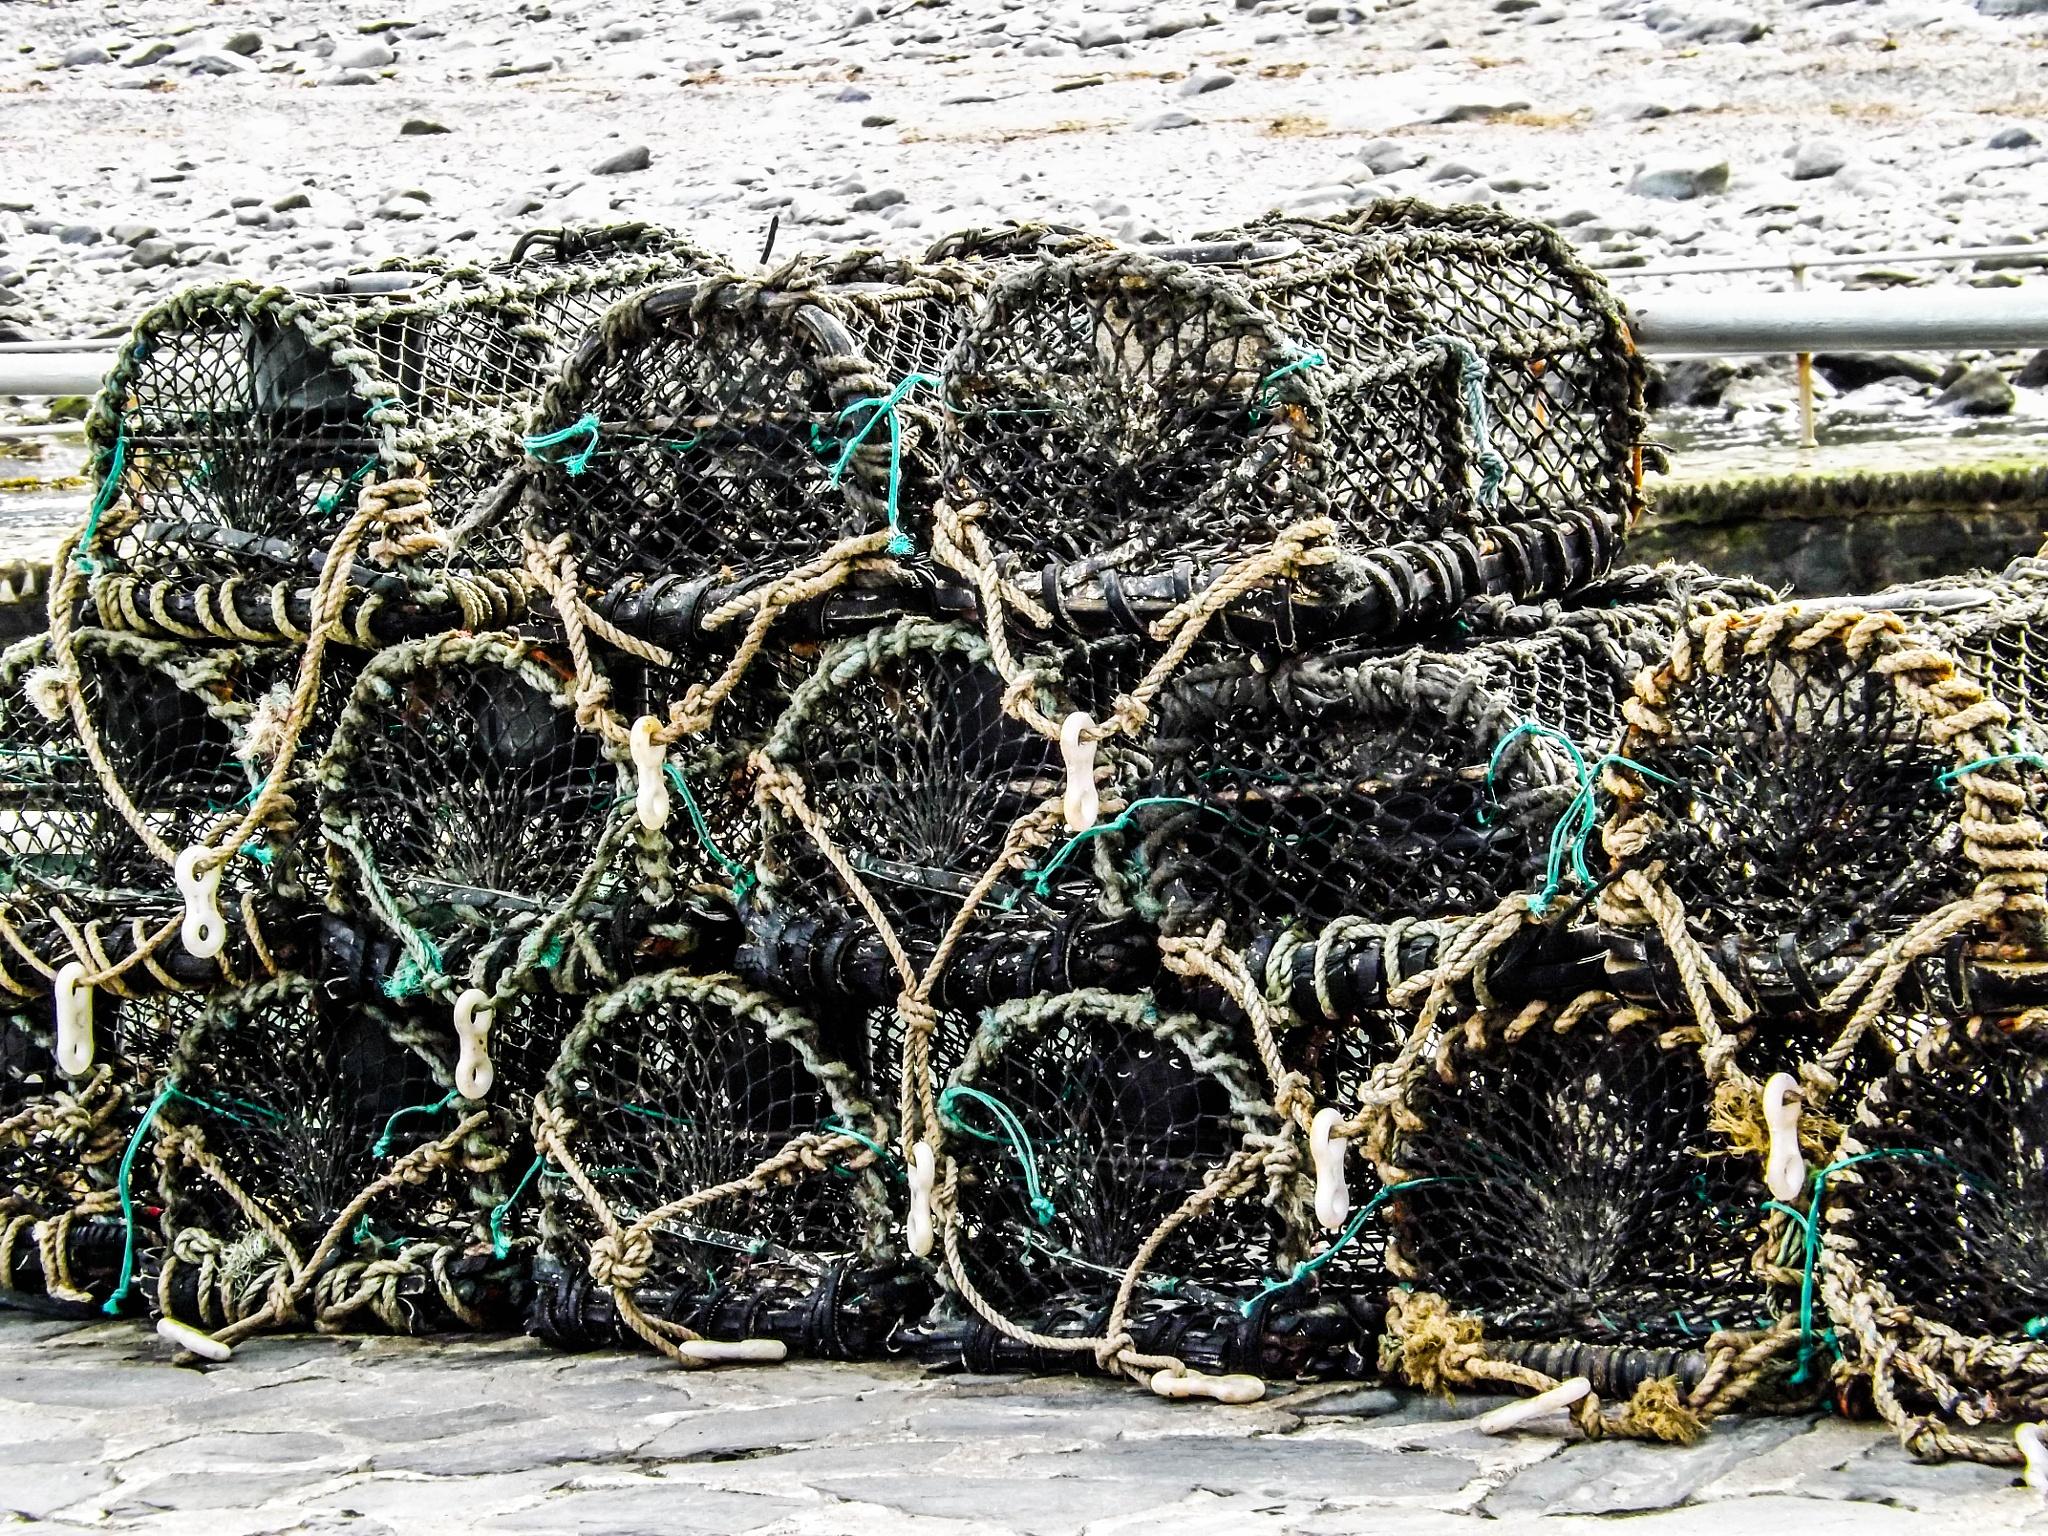 Lobster traps by Gemma Sizer